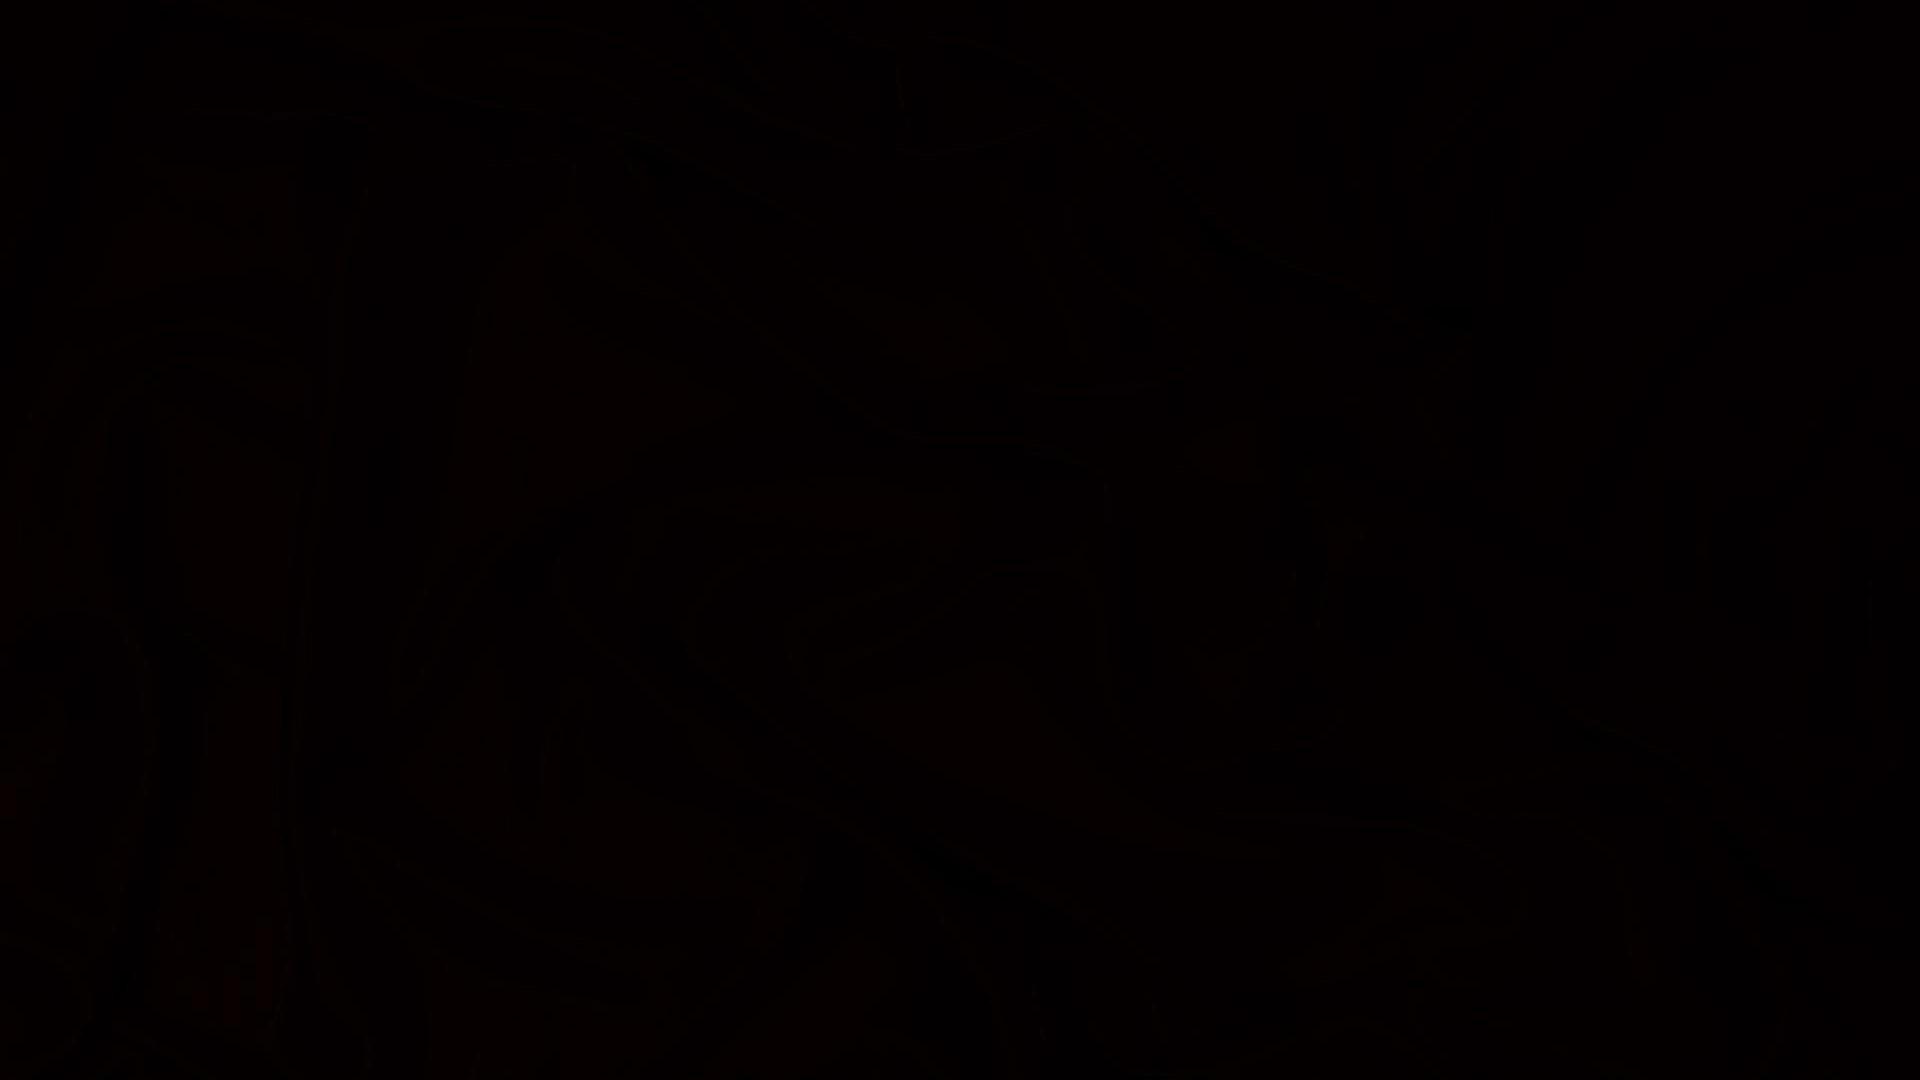 black wallpaper 1920x1080 76 images